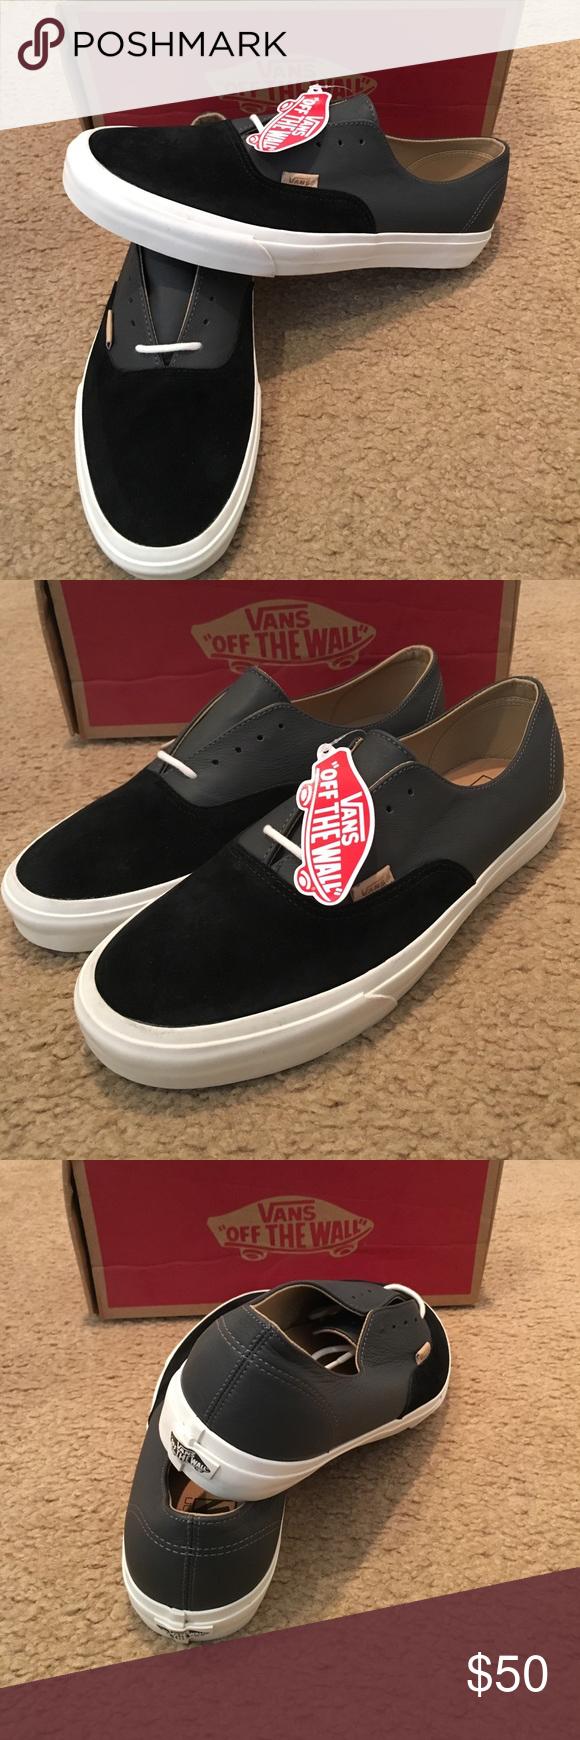 Authentic Decon Paige Suede Leather Vans New in box. Black Vans Shoes  Sneakers 7142fca5c